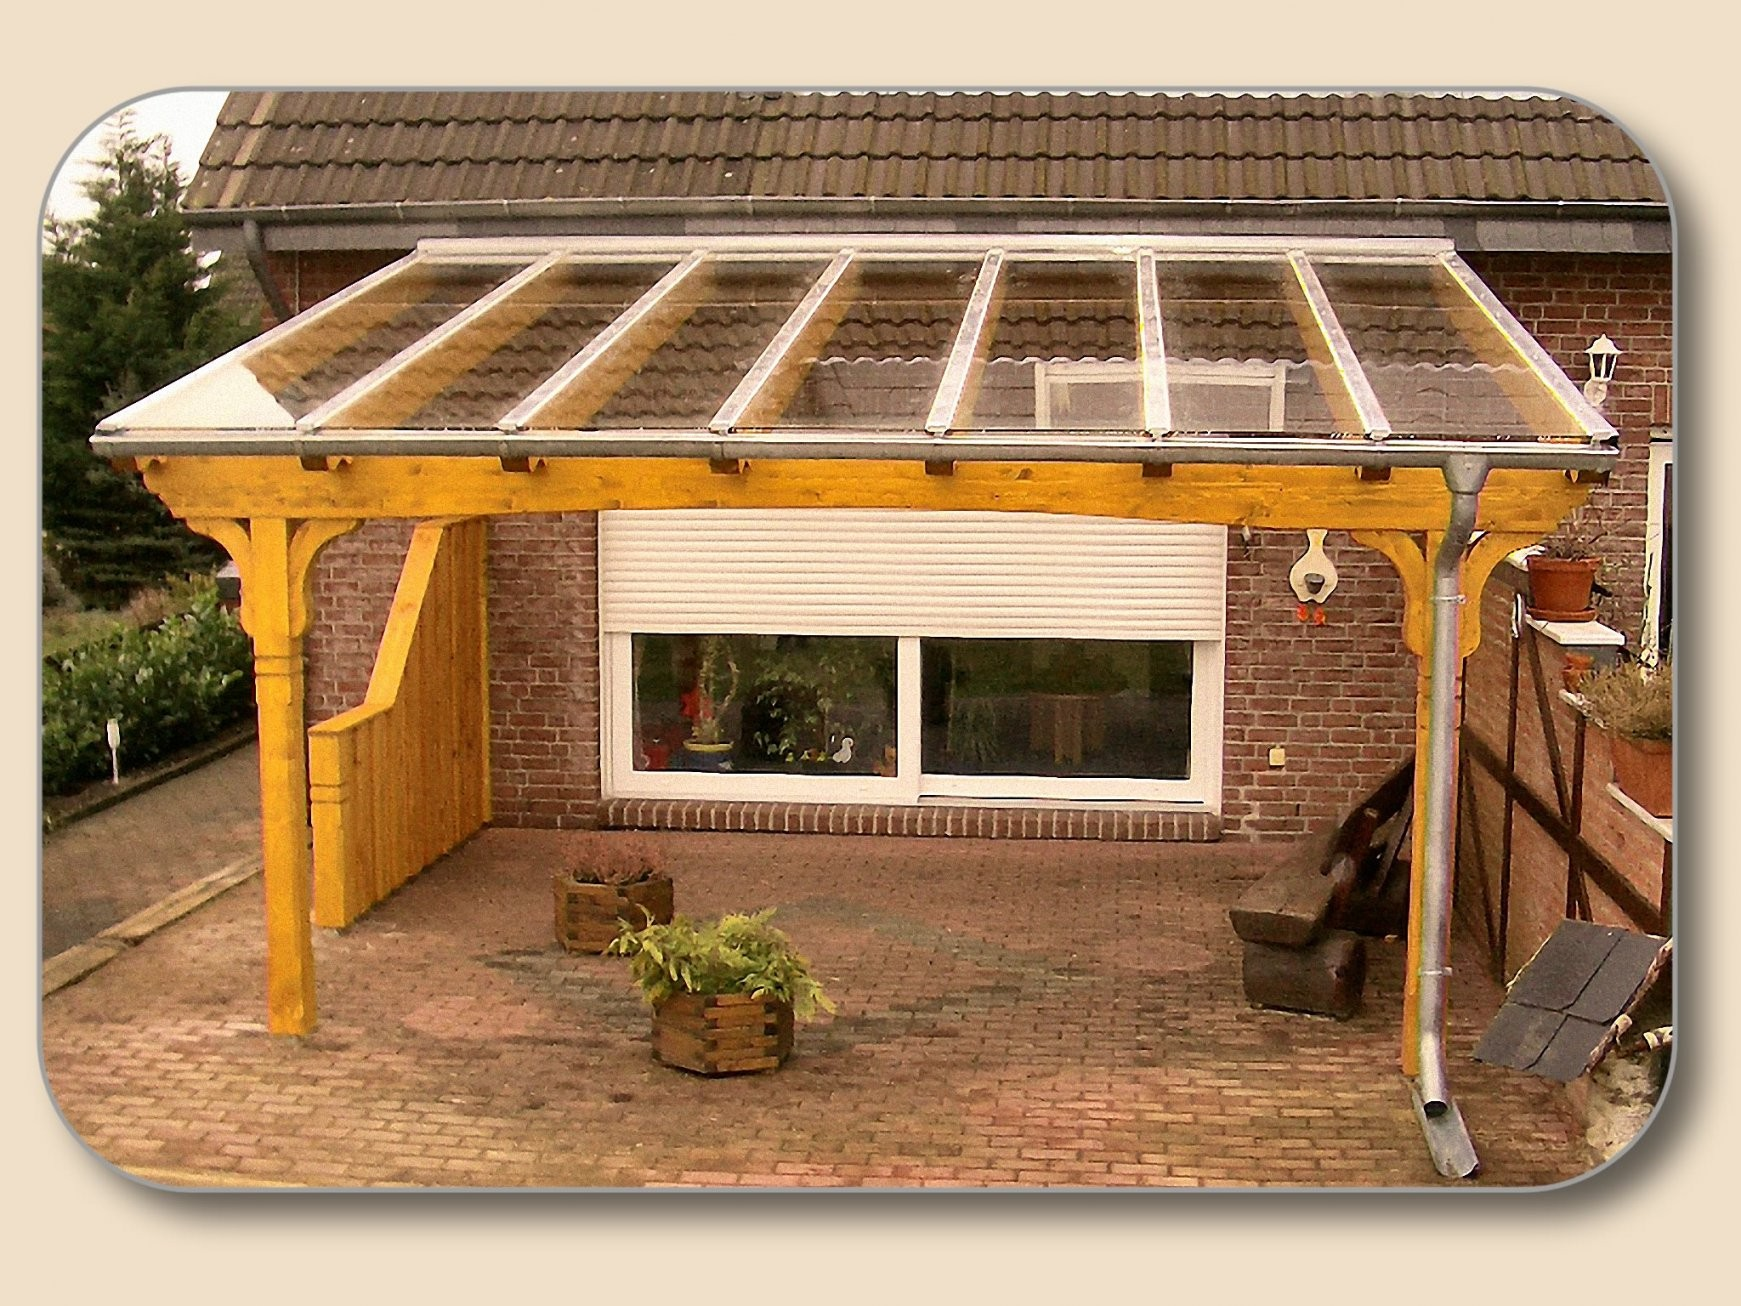 Terrassenüberdachung Glas Vsg Und Holz – Bausatz Von Holzon von Terrassenüberdachung Selbst Bauen Bild